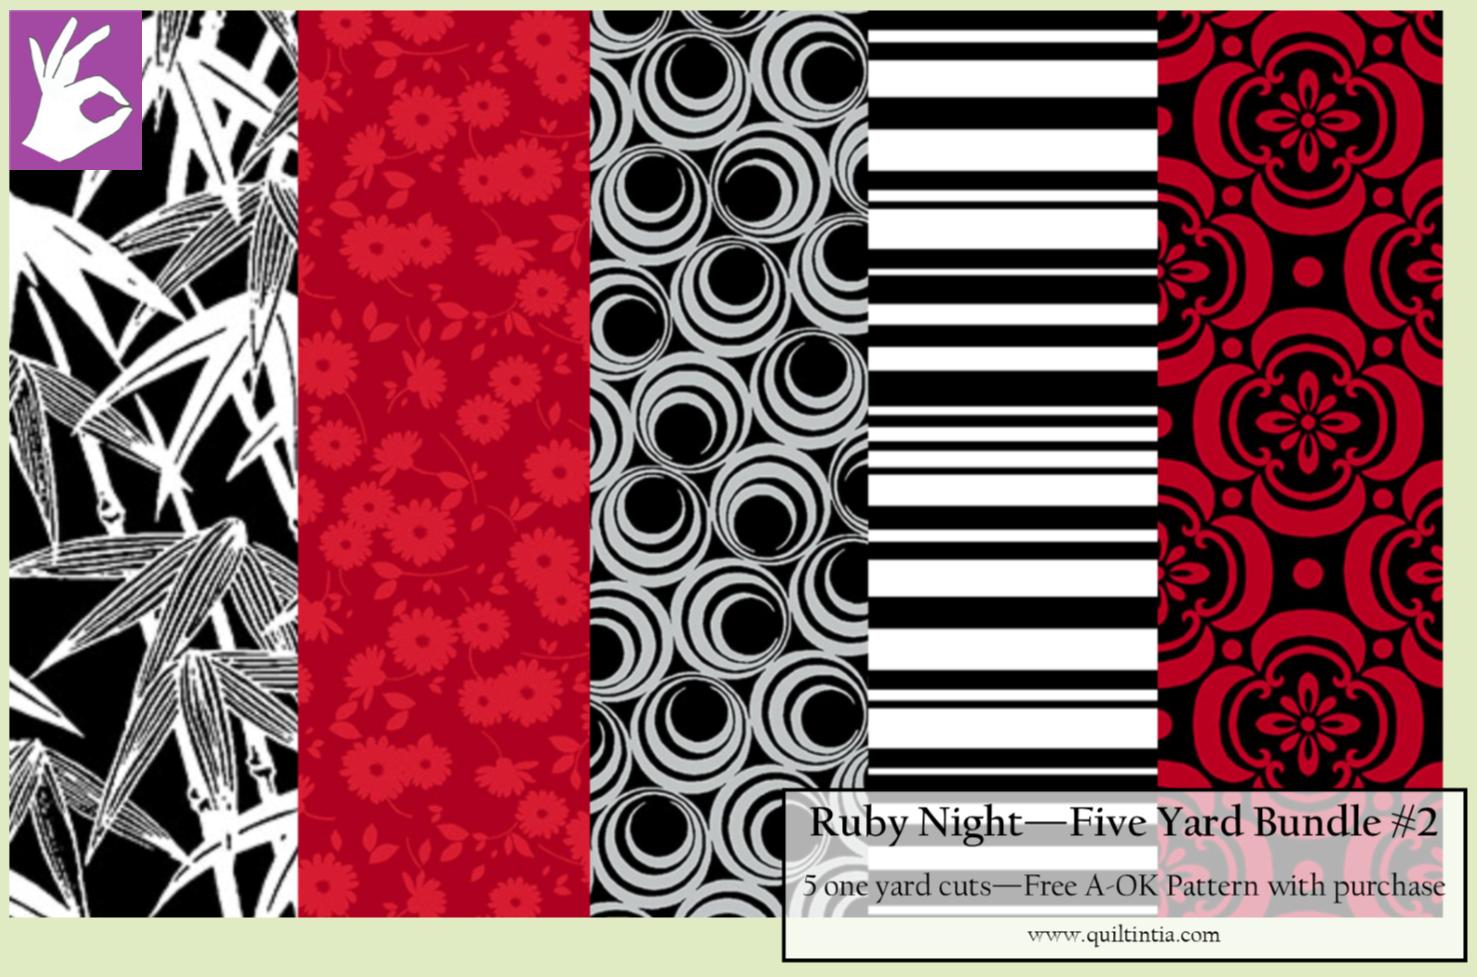 Ruby Night - Five Yard Bundle #2 - Free A-OK Pattern with Purchase